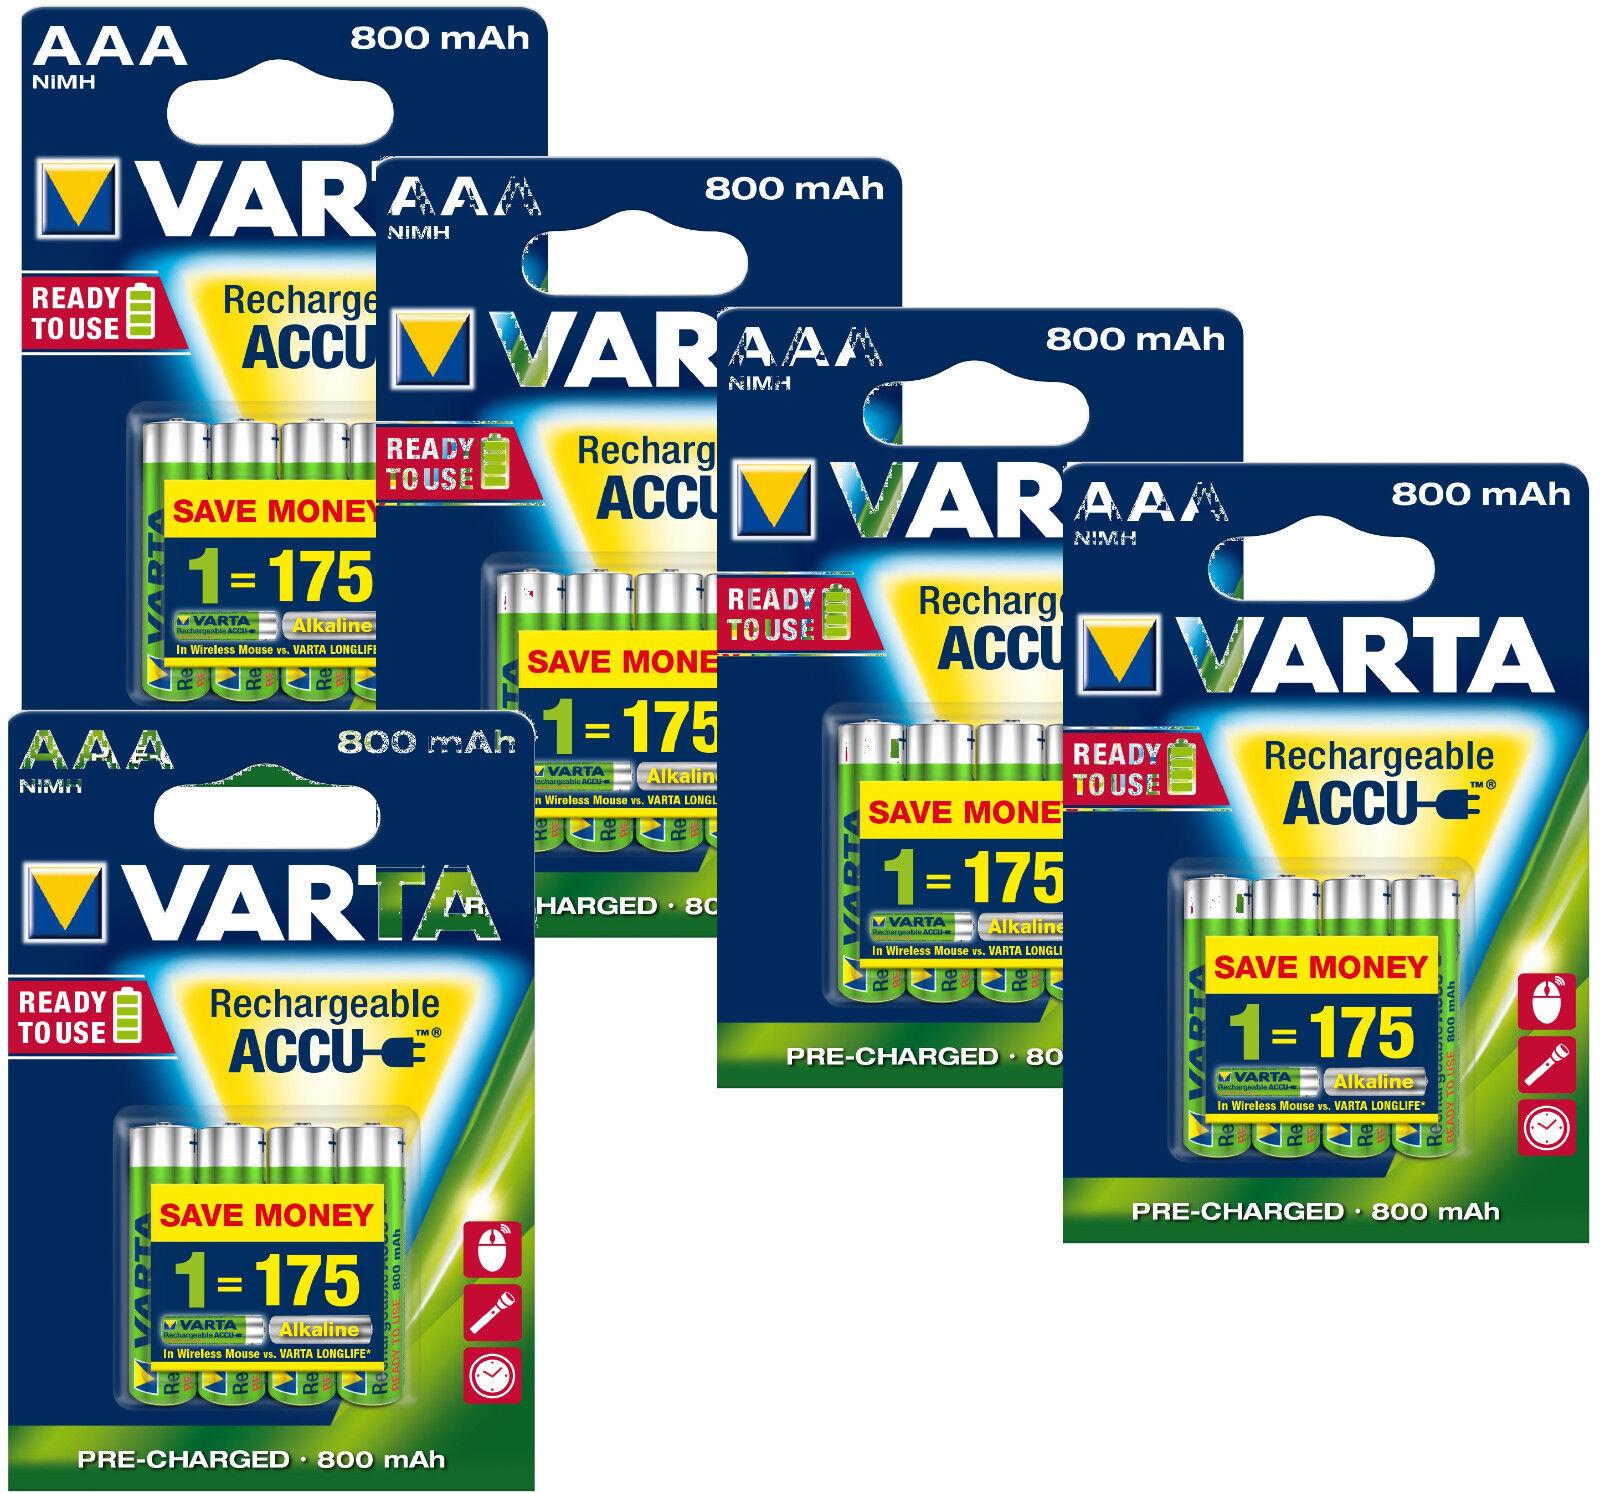 Varta AAA Micro Akku Accu NiMH Batterien 800 mAh für z.B. Phone Akku Telefon